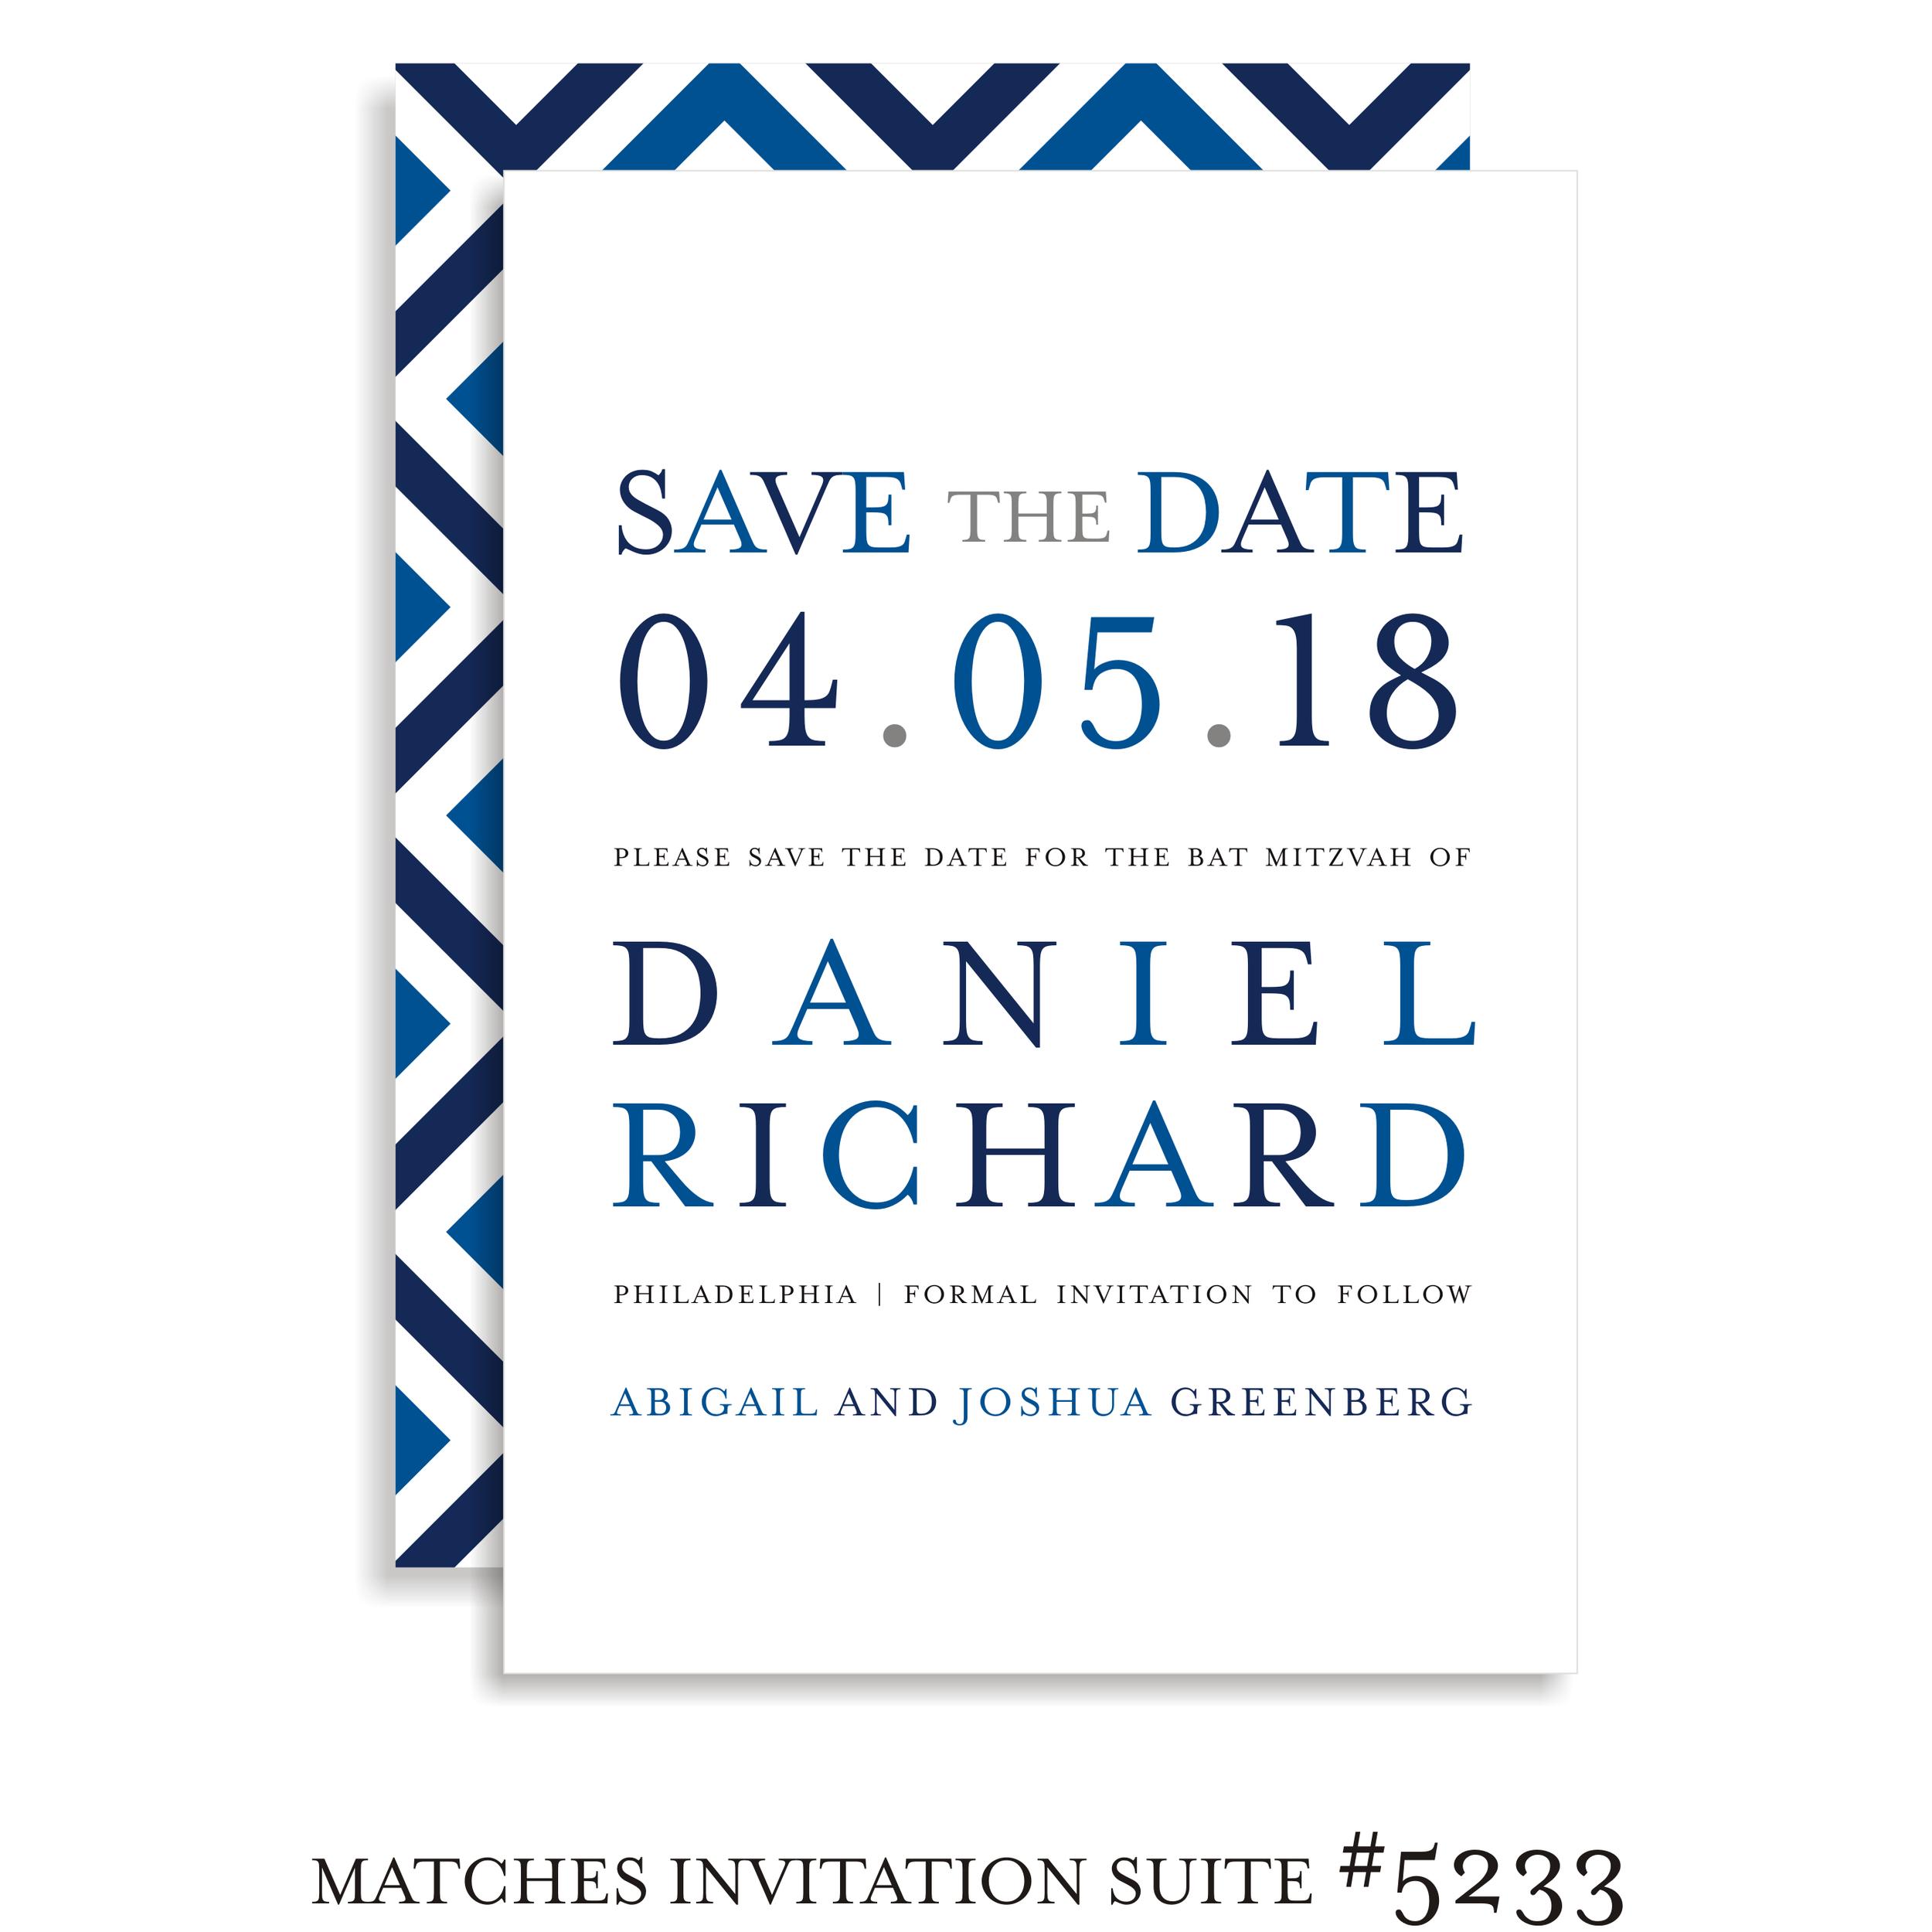 Save the Date Bar Mitzvah Suite 5233 - Daniel Richard